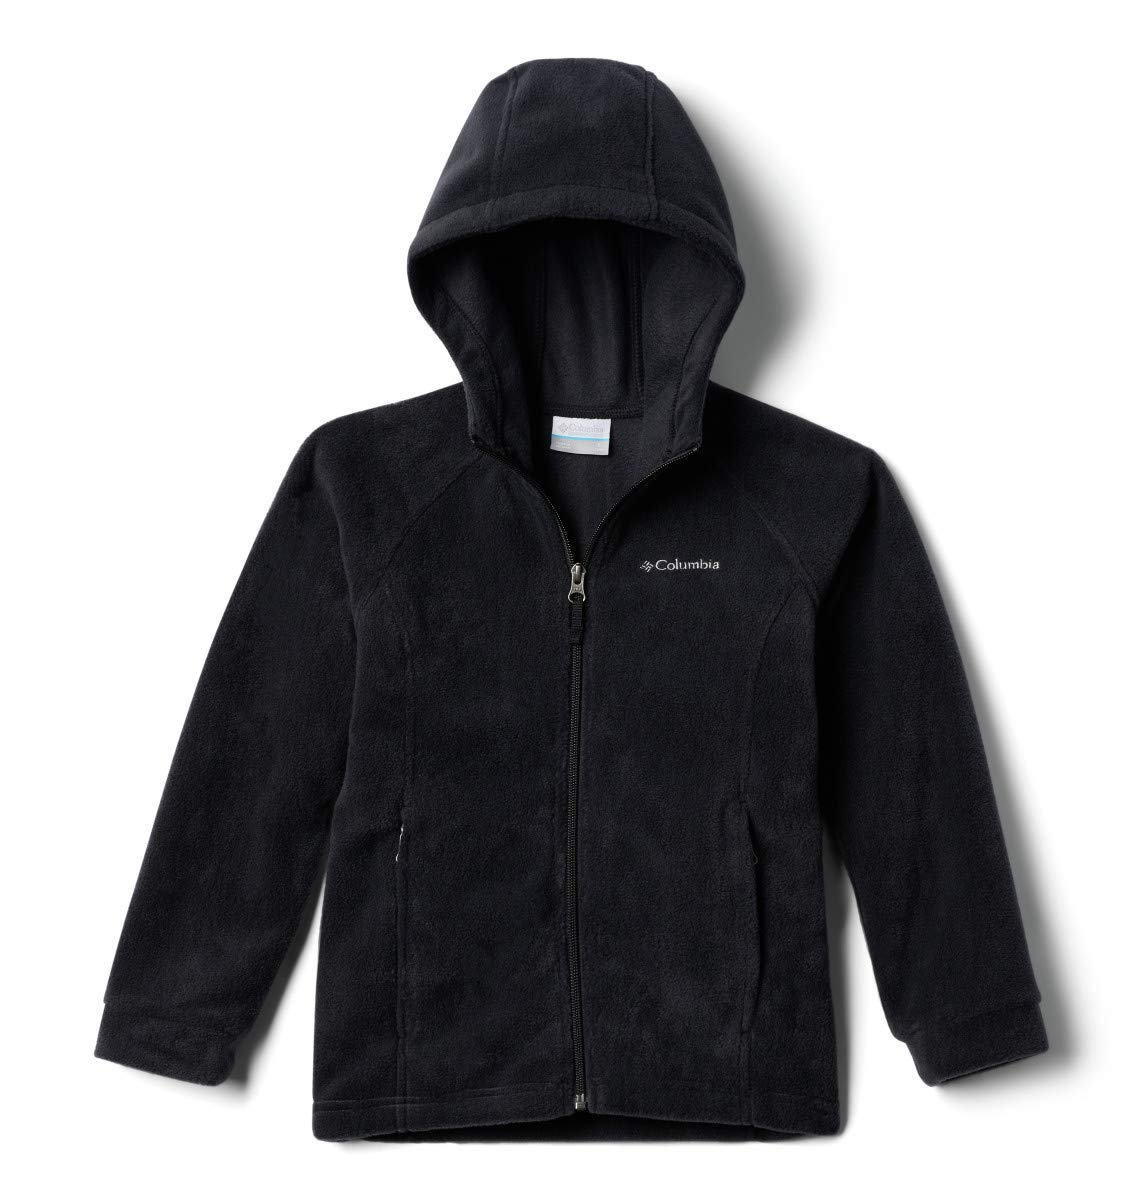 Columbia Big Girls' Benton II Hoodie Jacket, Black/Black, Medium (10/12)